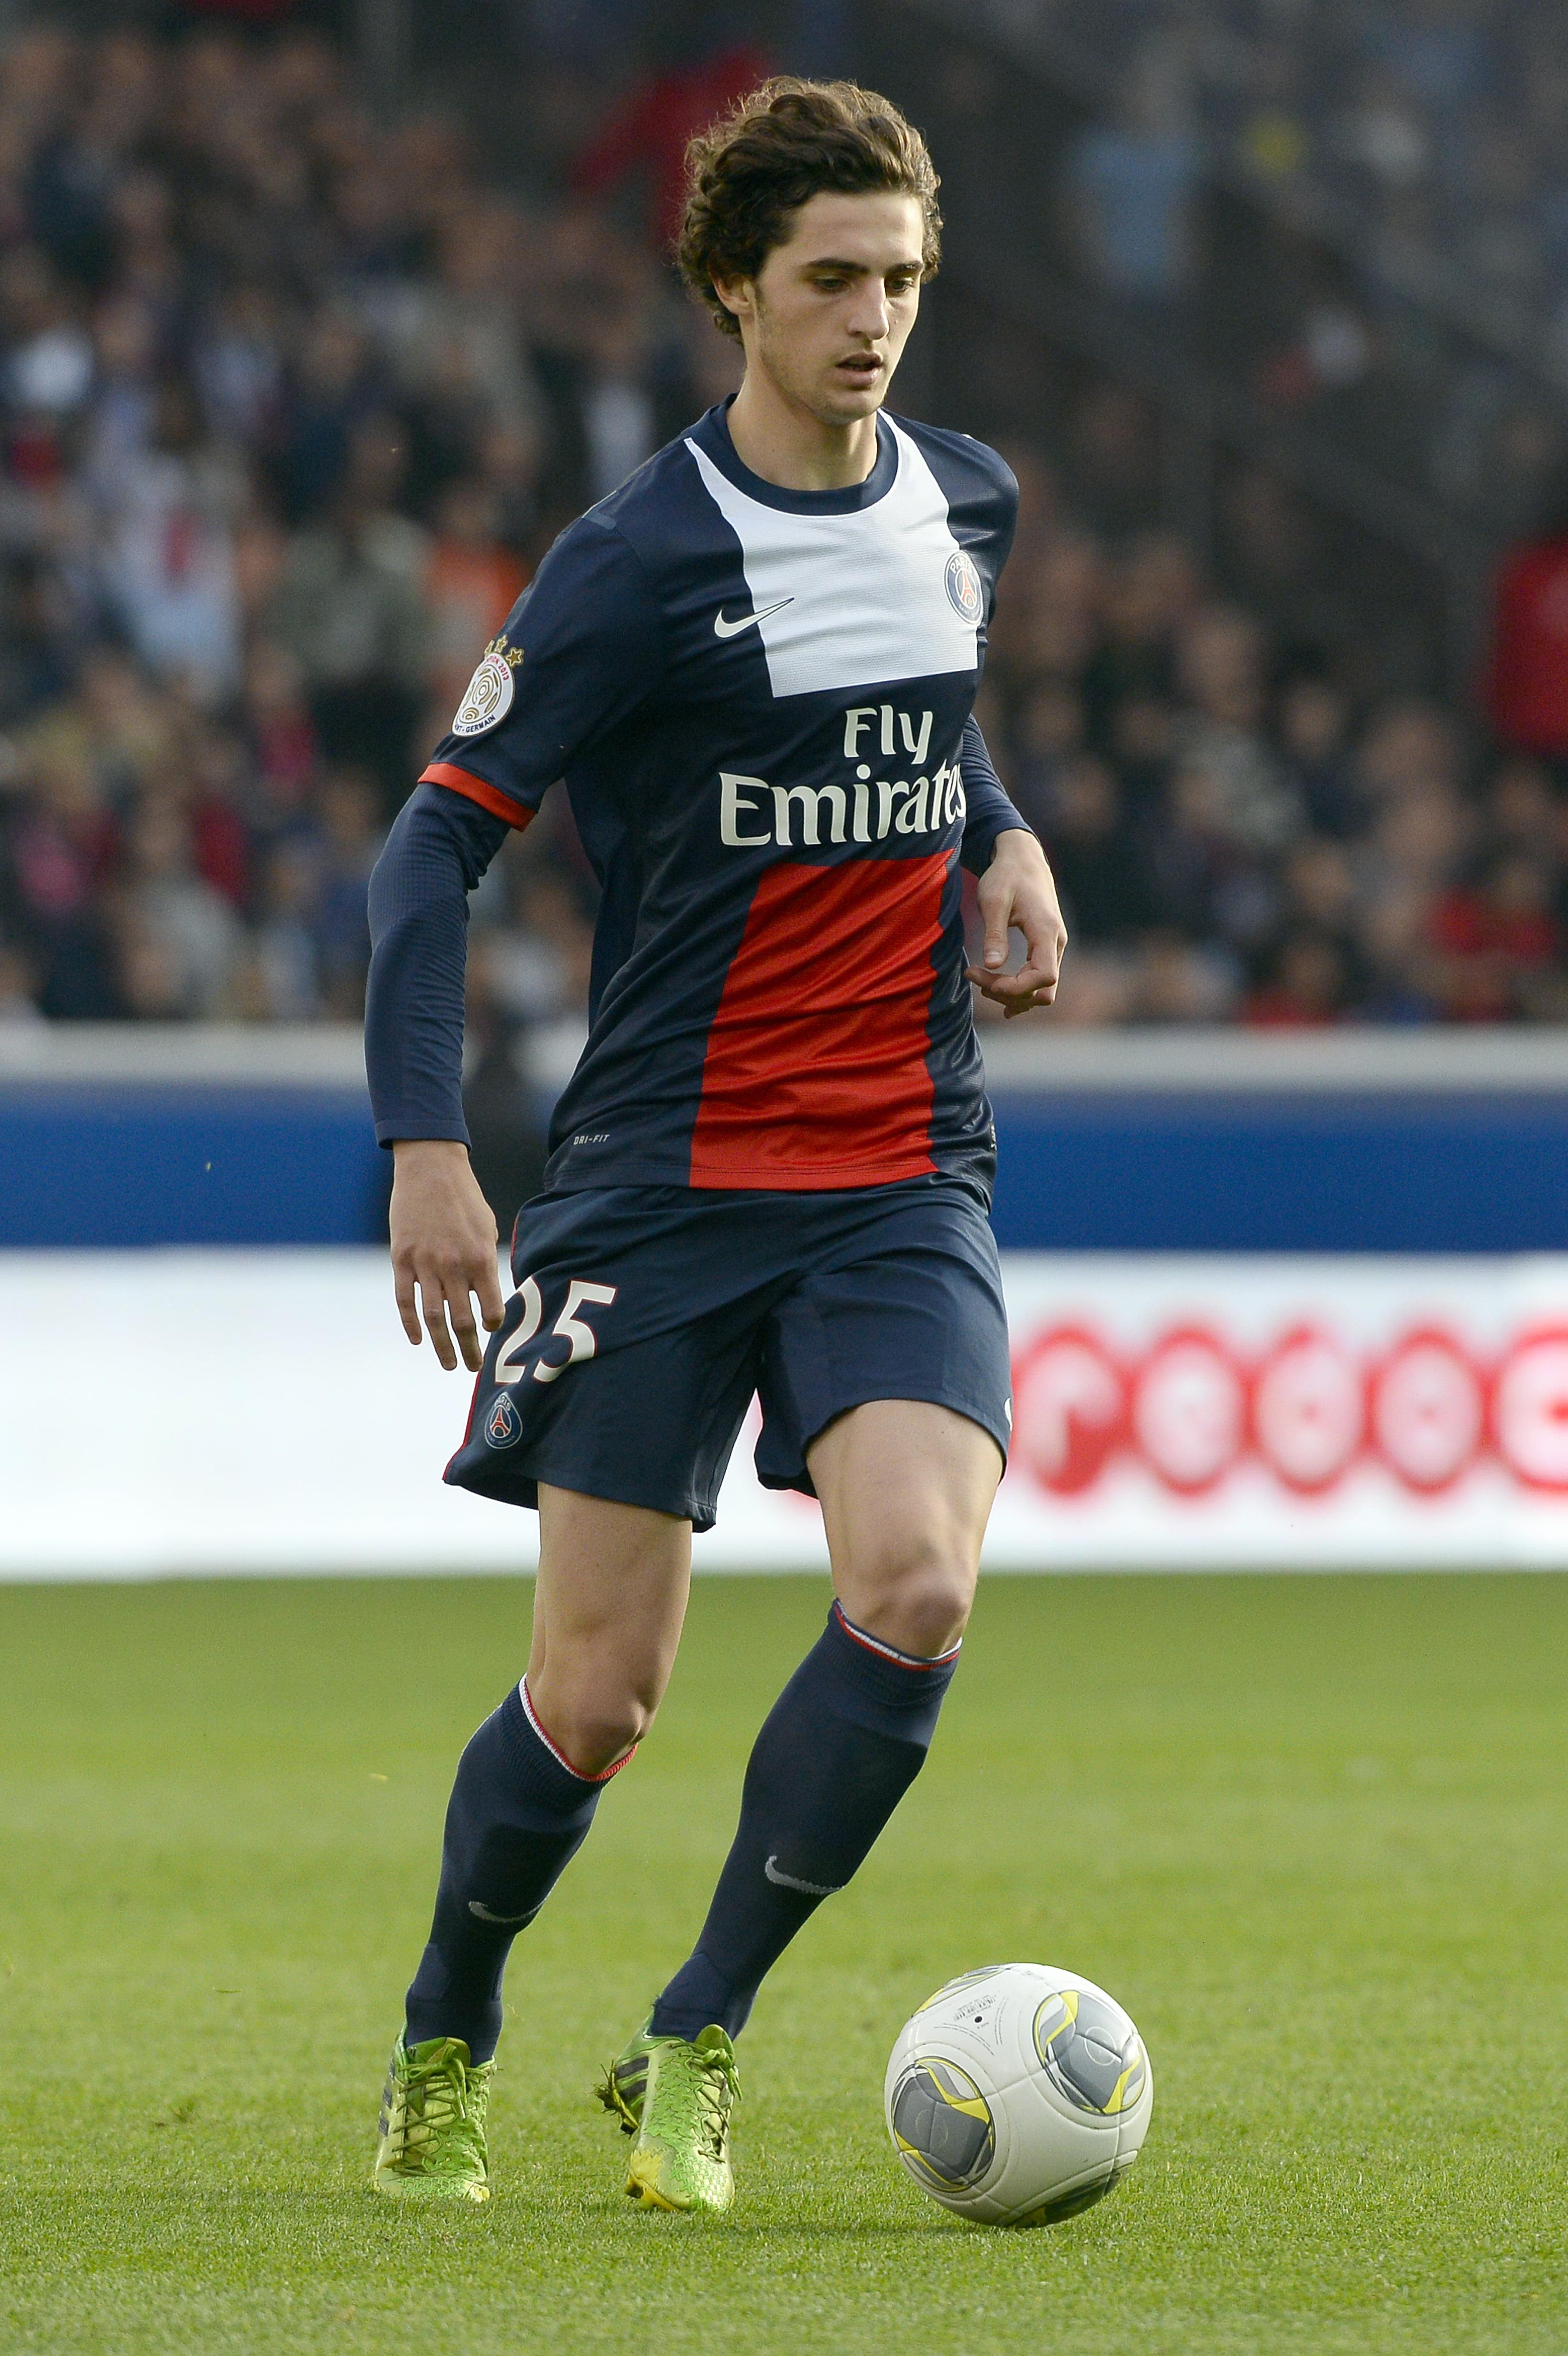 Photo of لاعب وسط باريس سان جيرمان لتعويض فيدال في يوفنتوس